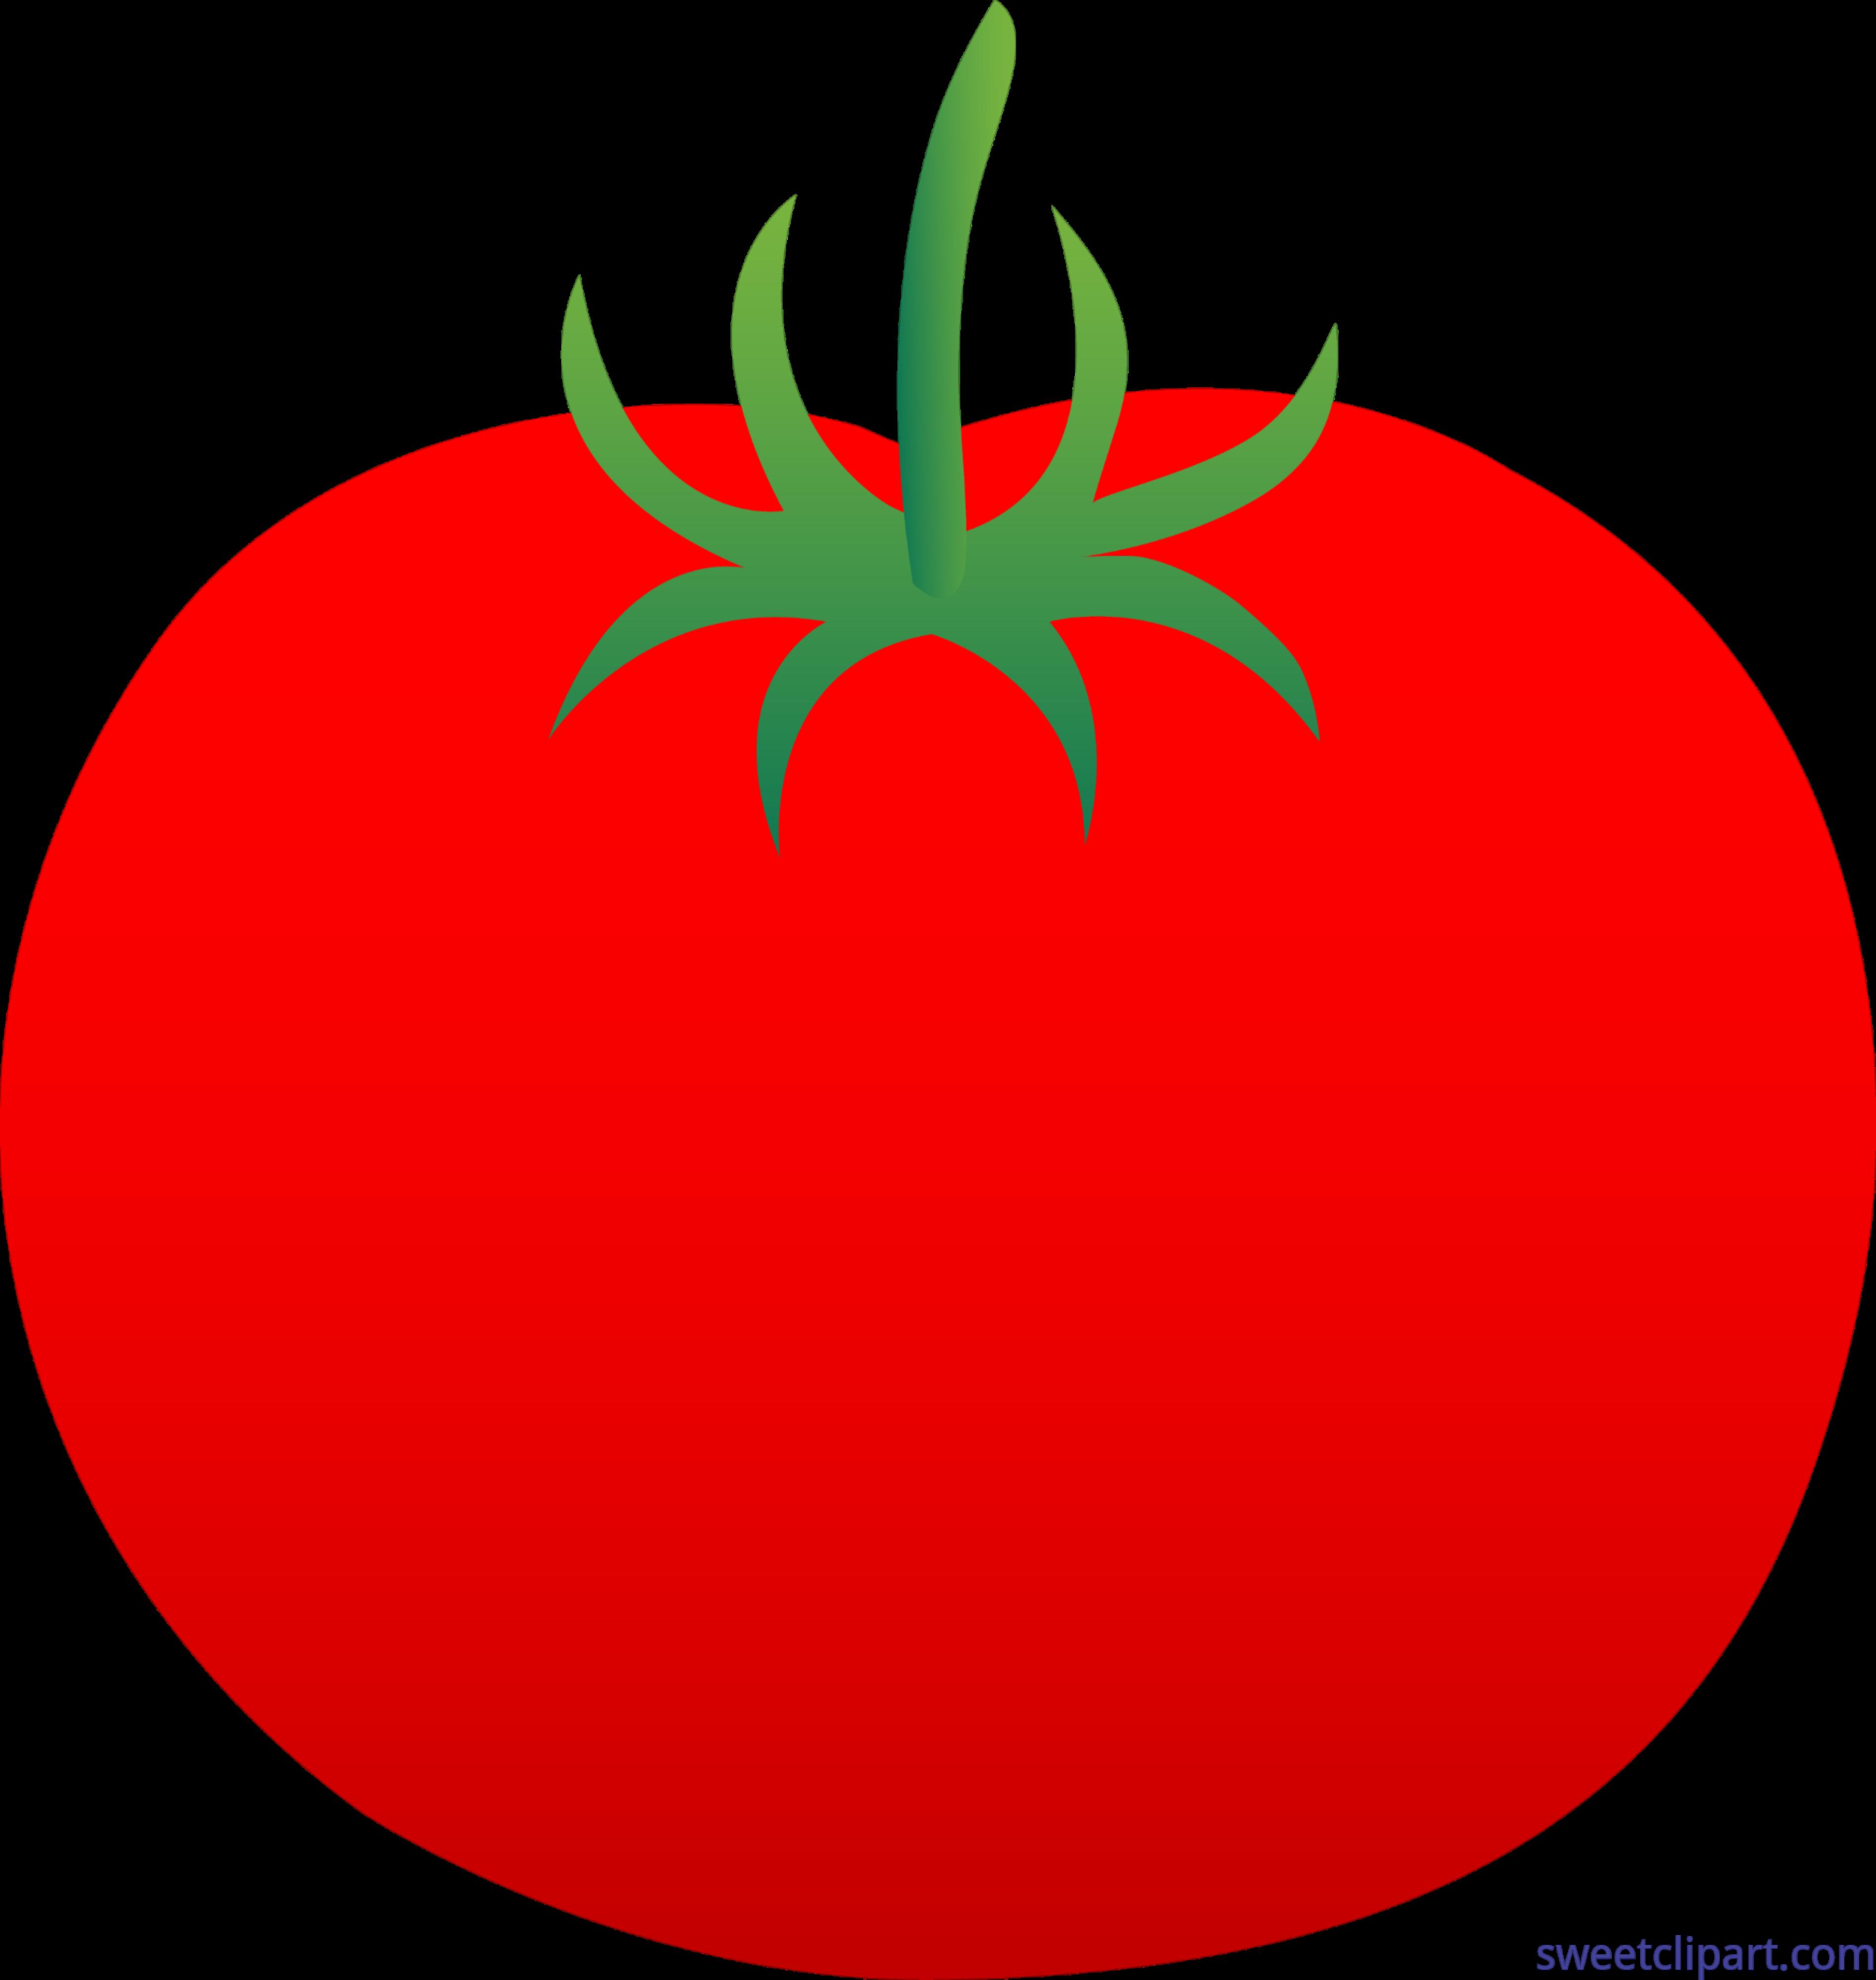 red tomato clip art sweet clip art rh m sweetclipart com tomato clip art black and white tomato soup clipart